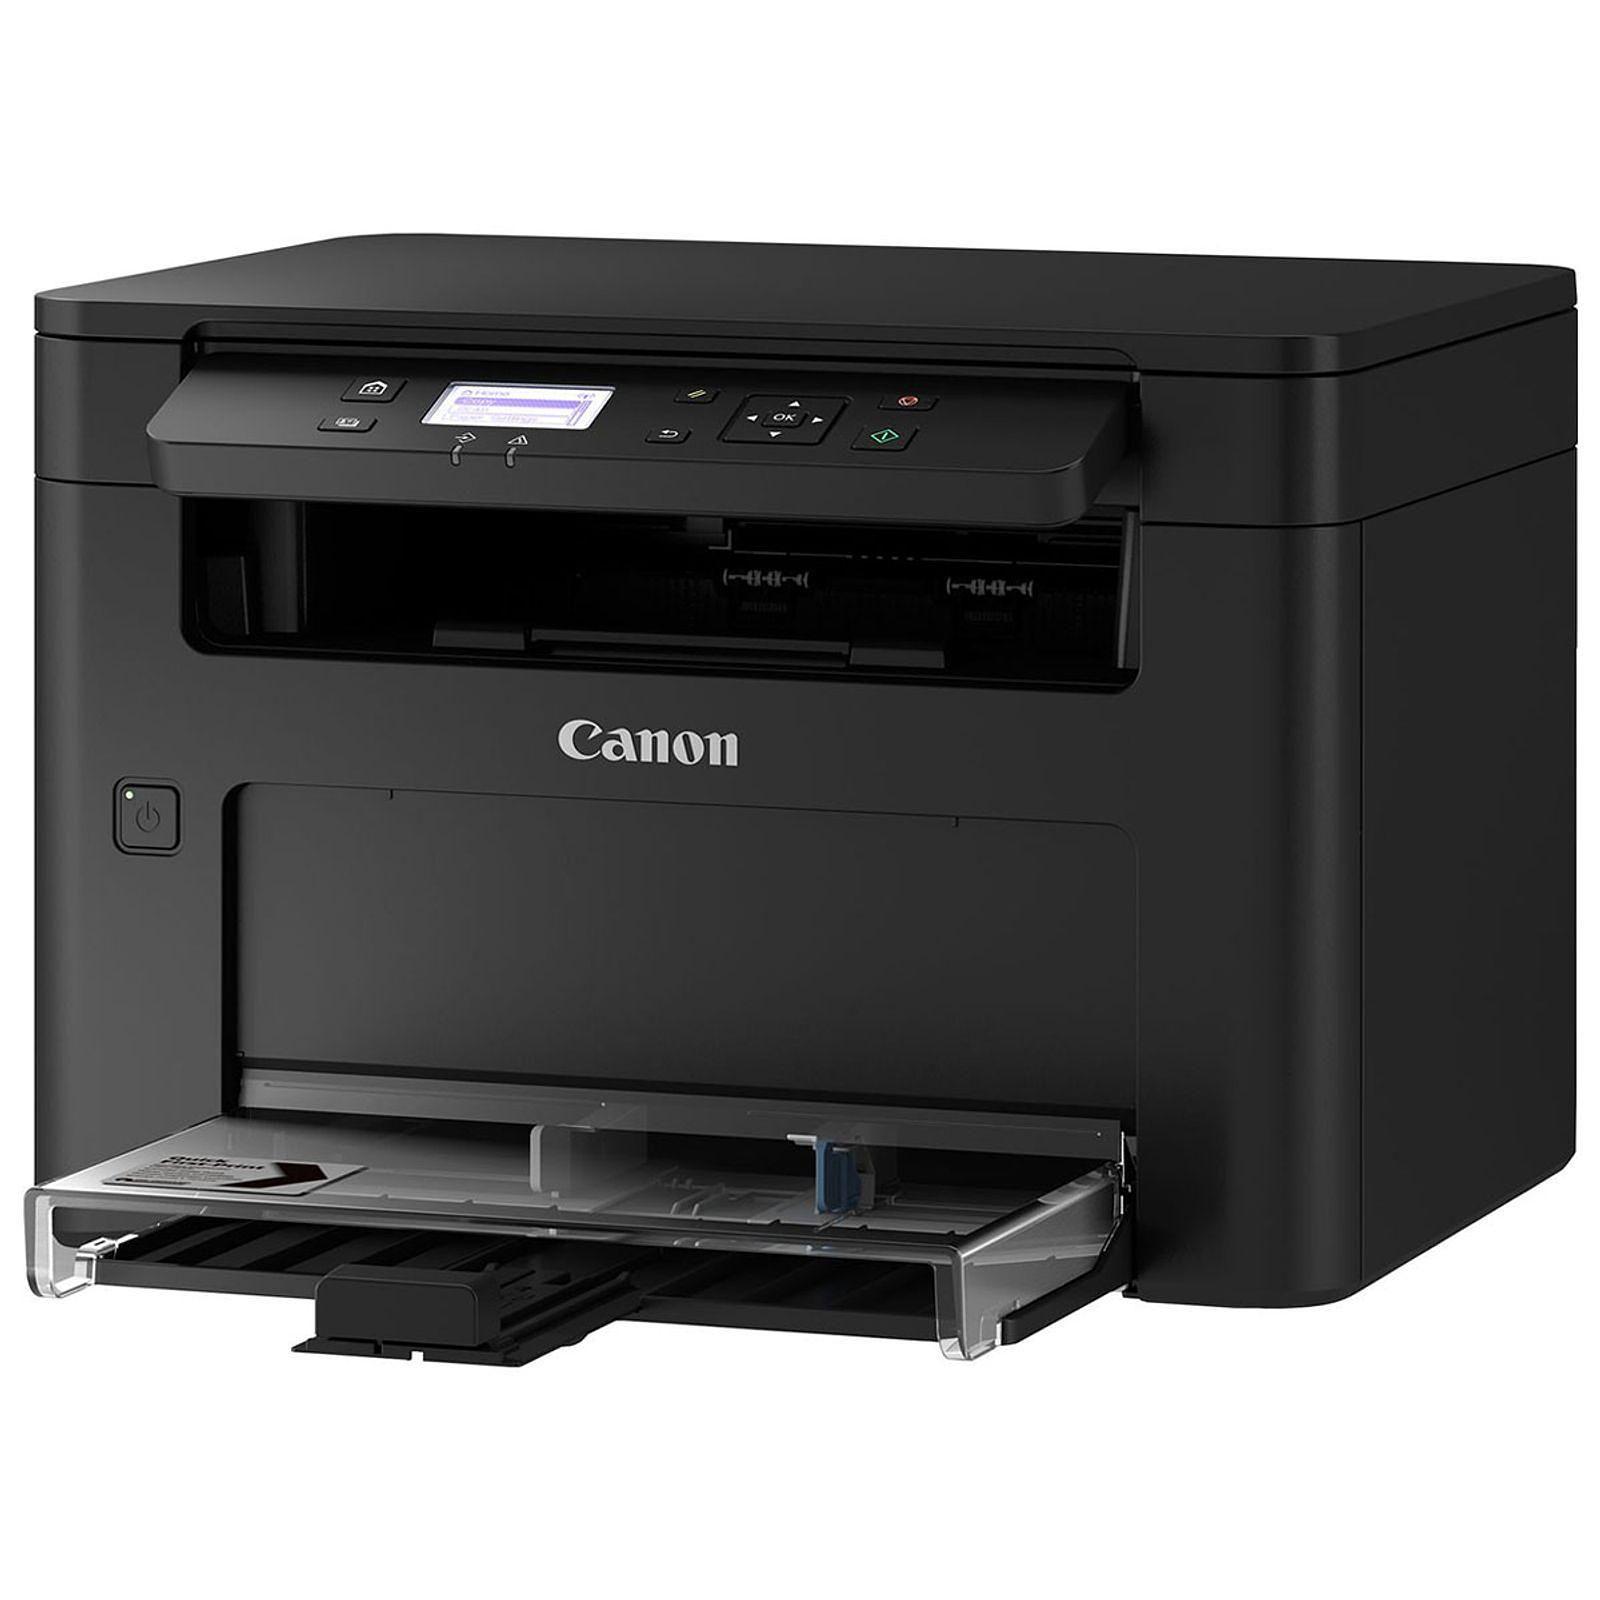 Imprimante multifonction Canon i-SENSYS MF112 - Cybertek.fr - 4